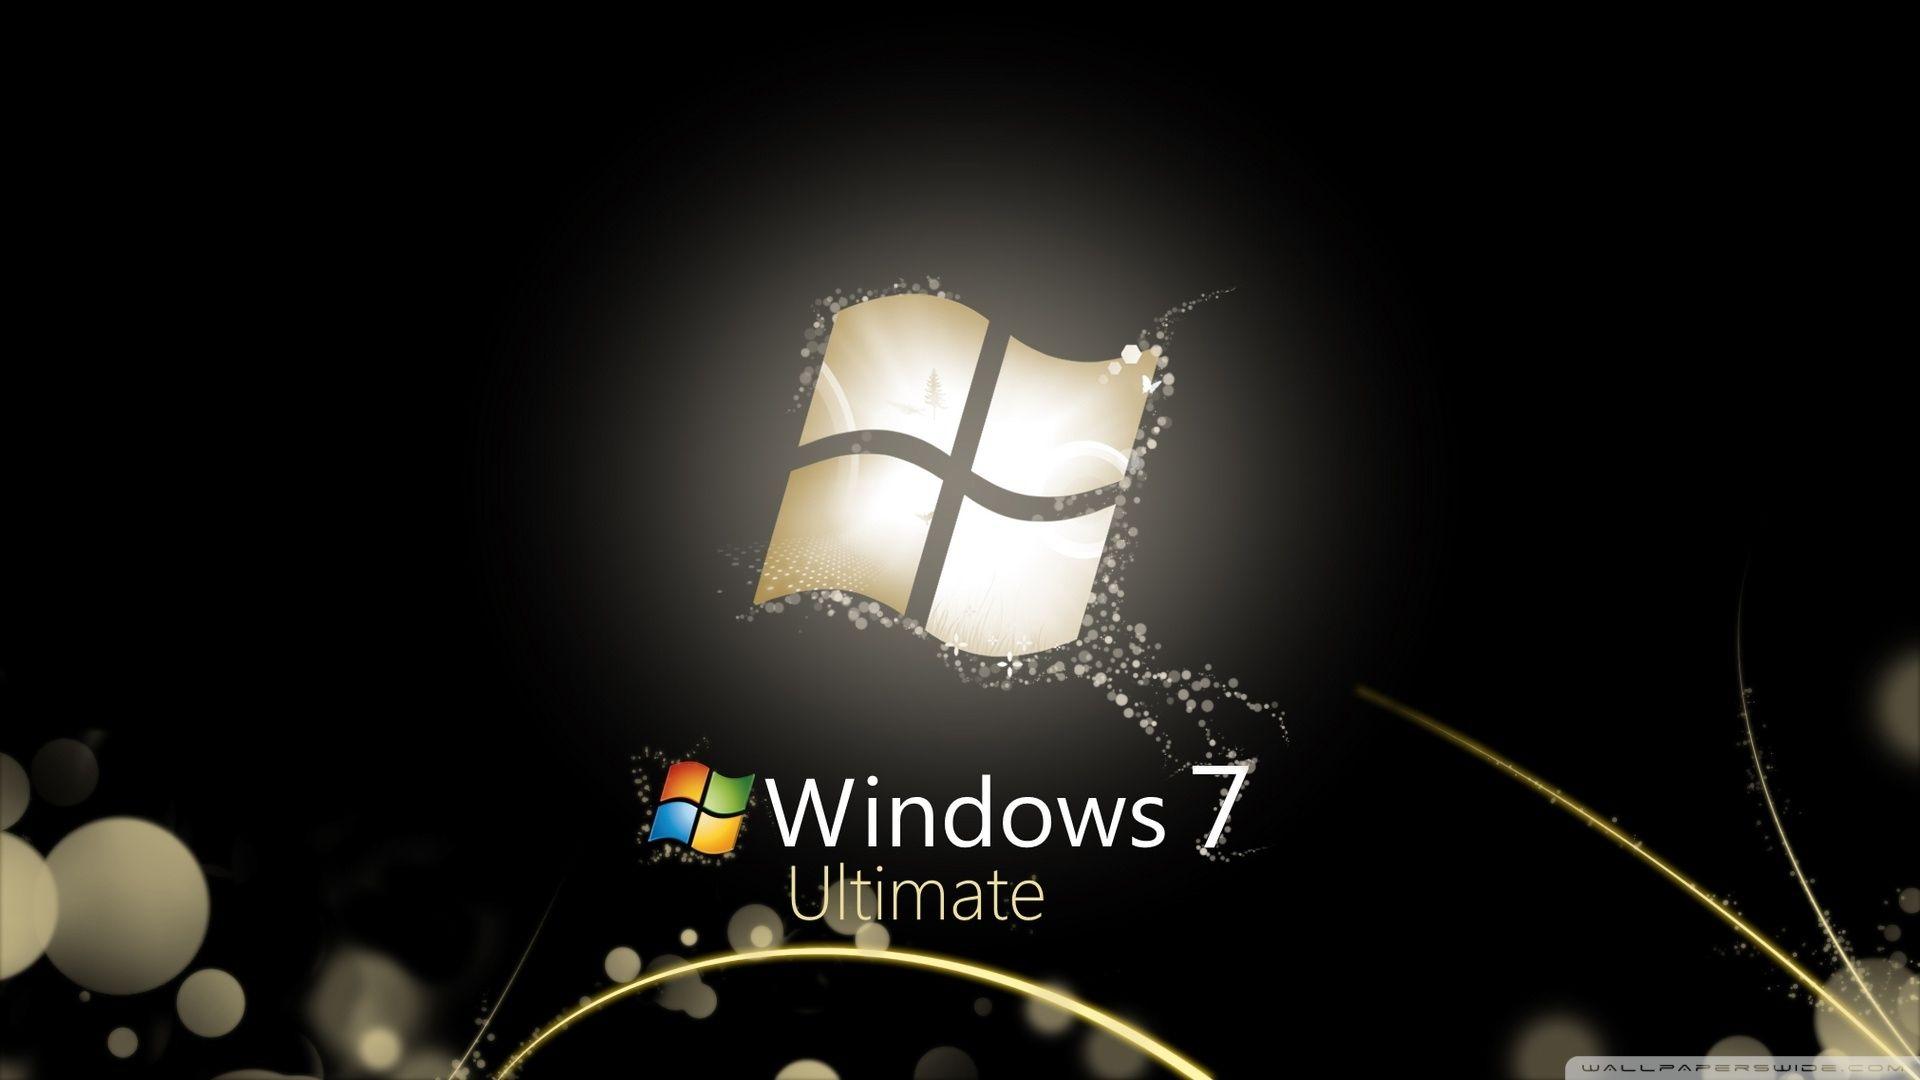 10 New High Definition Wallpapers Windows 7 Full Hd 1920 1080 For Pc Desktop New Wallpaper Hd Top Hd Wallpapers Hd Wallpaper